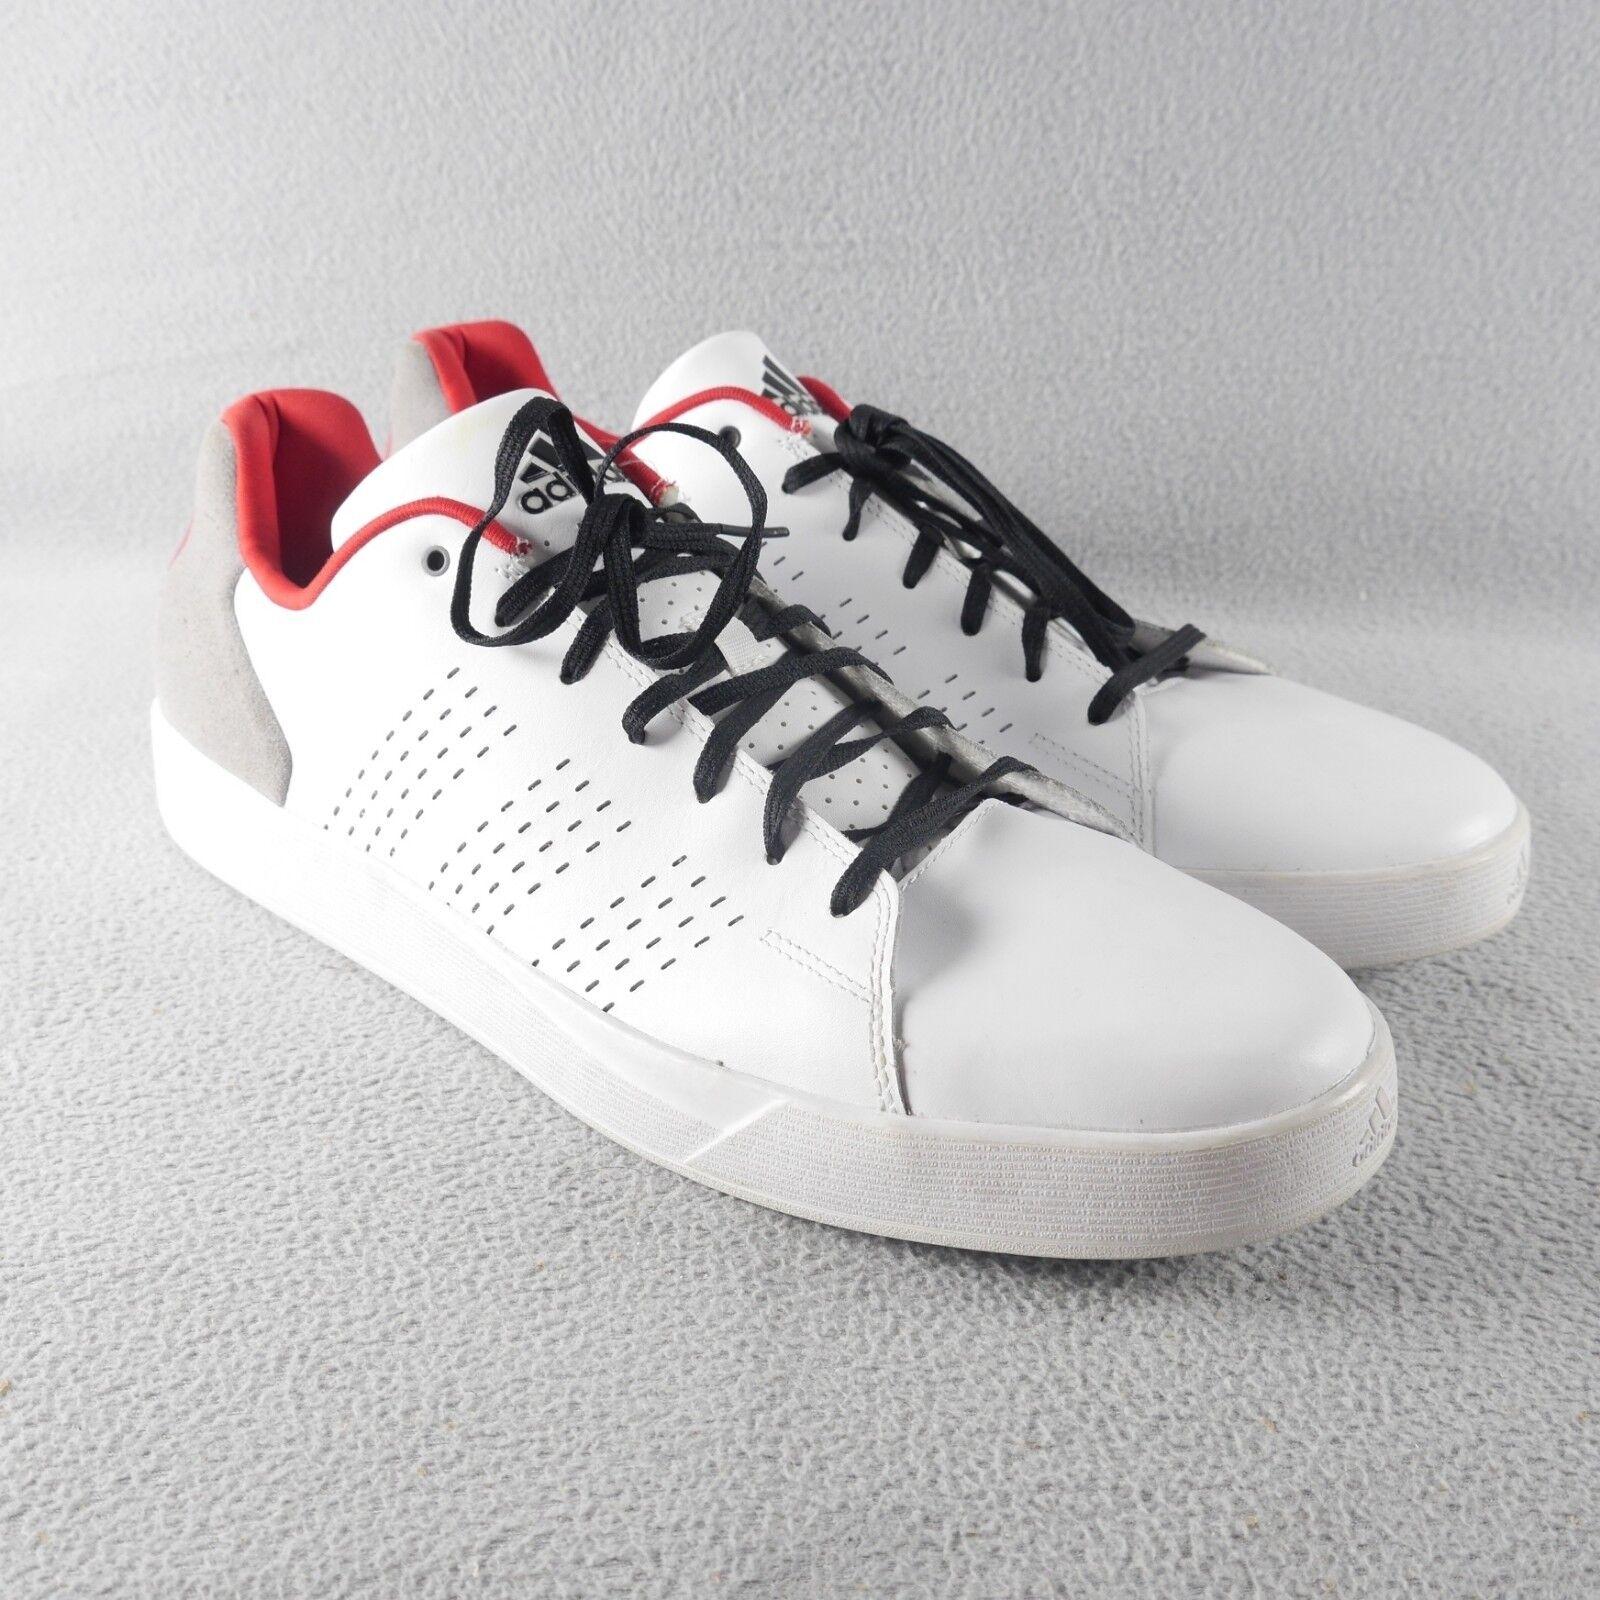 Nwob adidas c75749 d rose / lakeshore niedrigen weißen / blk / rose ROT / gry männer abn - größe. 8f838d